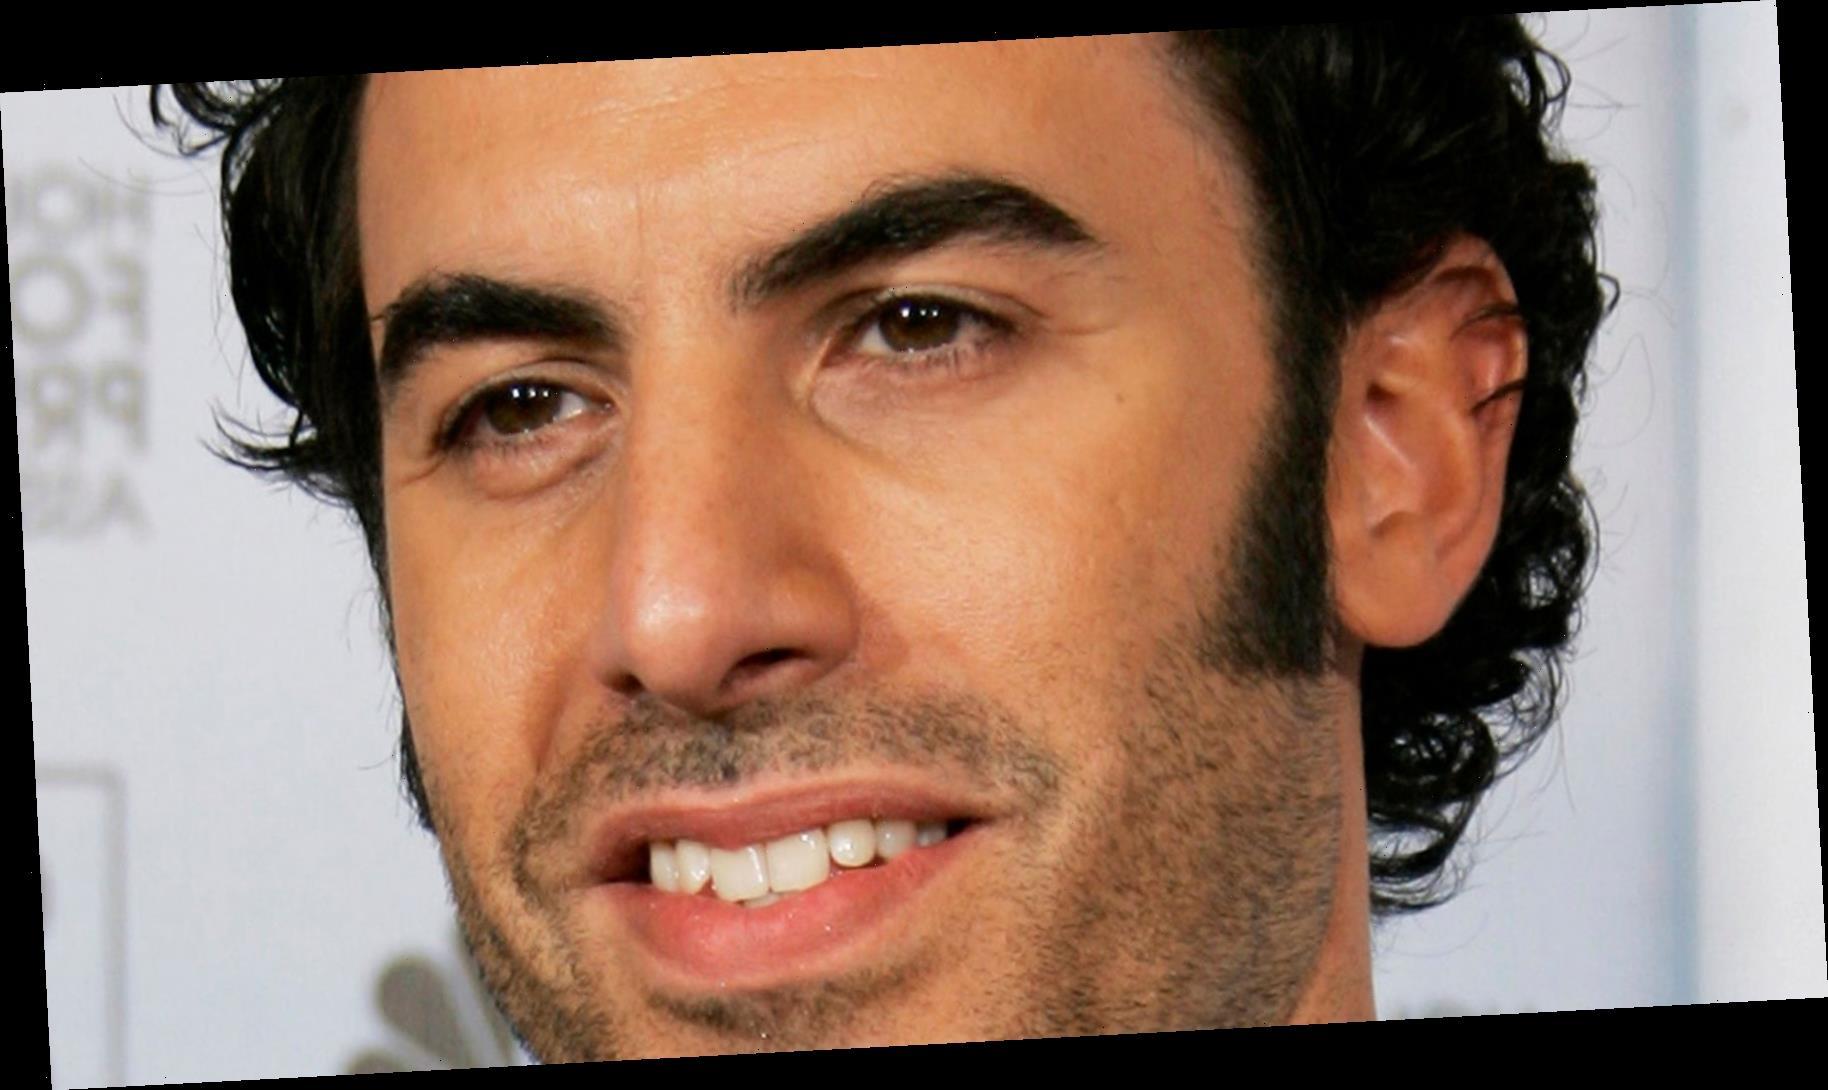 Sacha Baron Cohen's 'Borat' Sequel Streaming On Amazon Before Nov. 3 Election